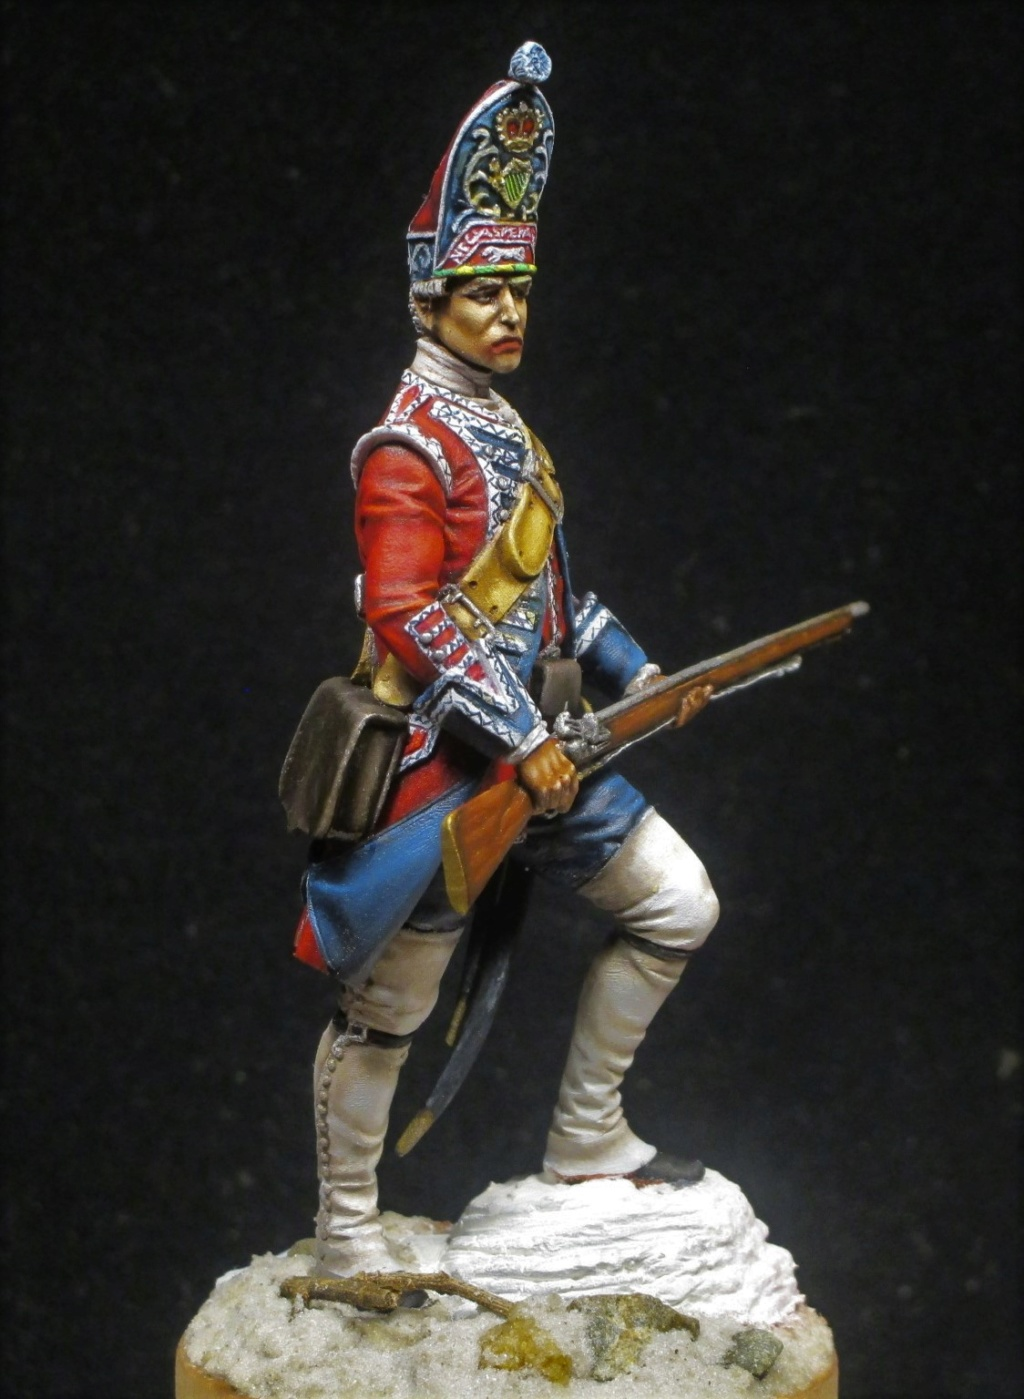 grenadier anglais du 18th Foot en 1751 Img_1213